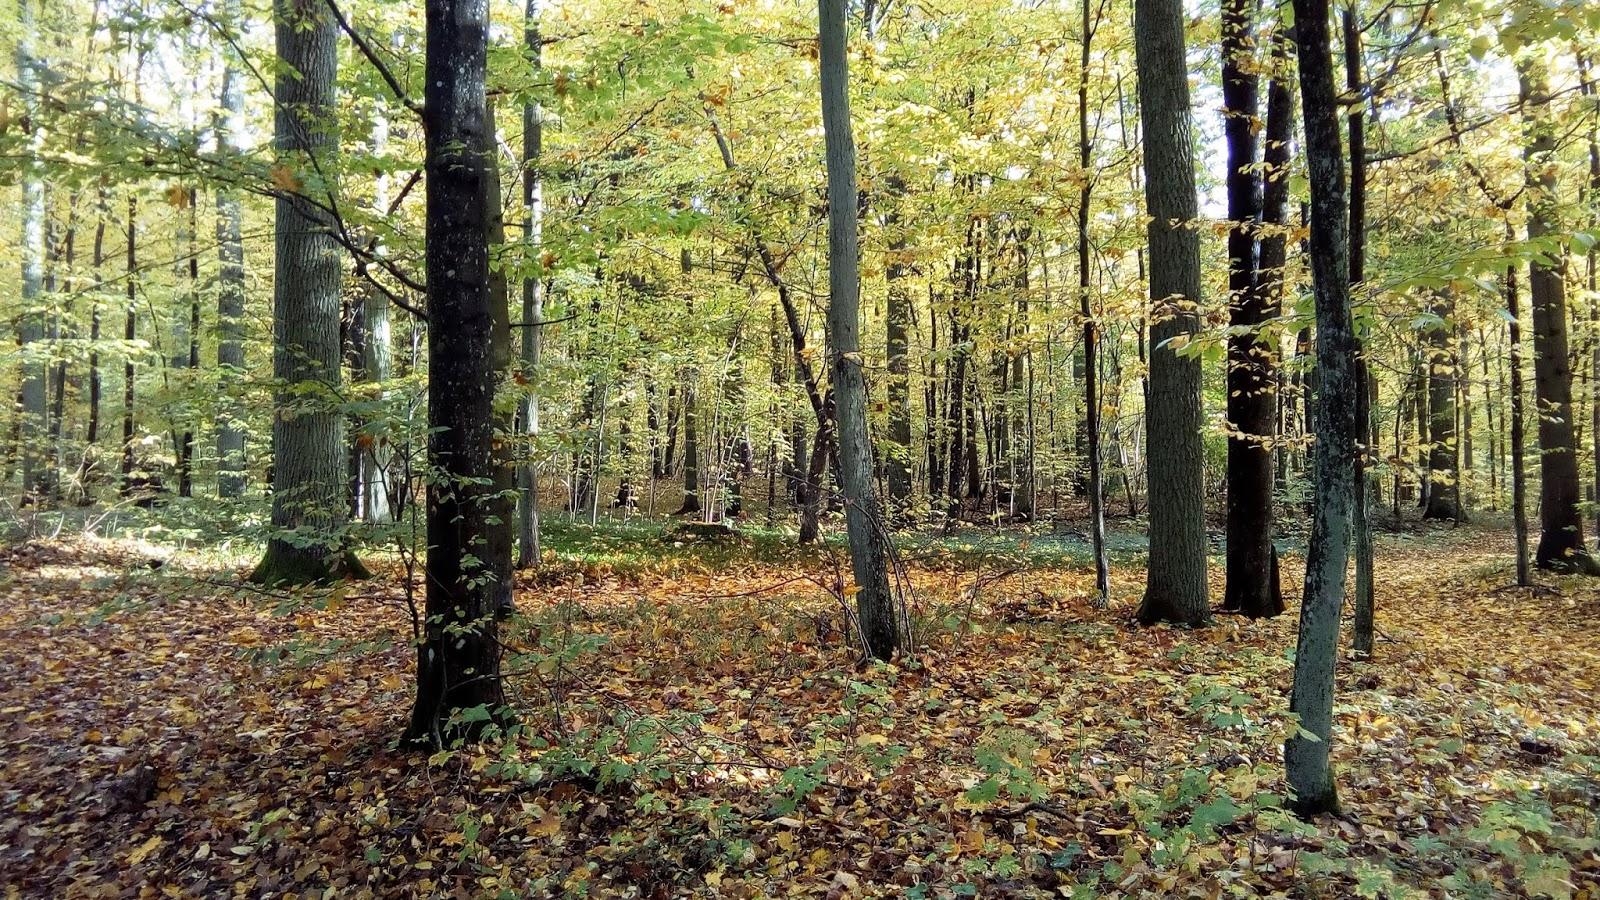 The autumnal Masuria